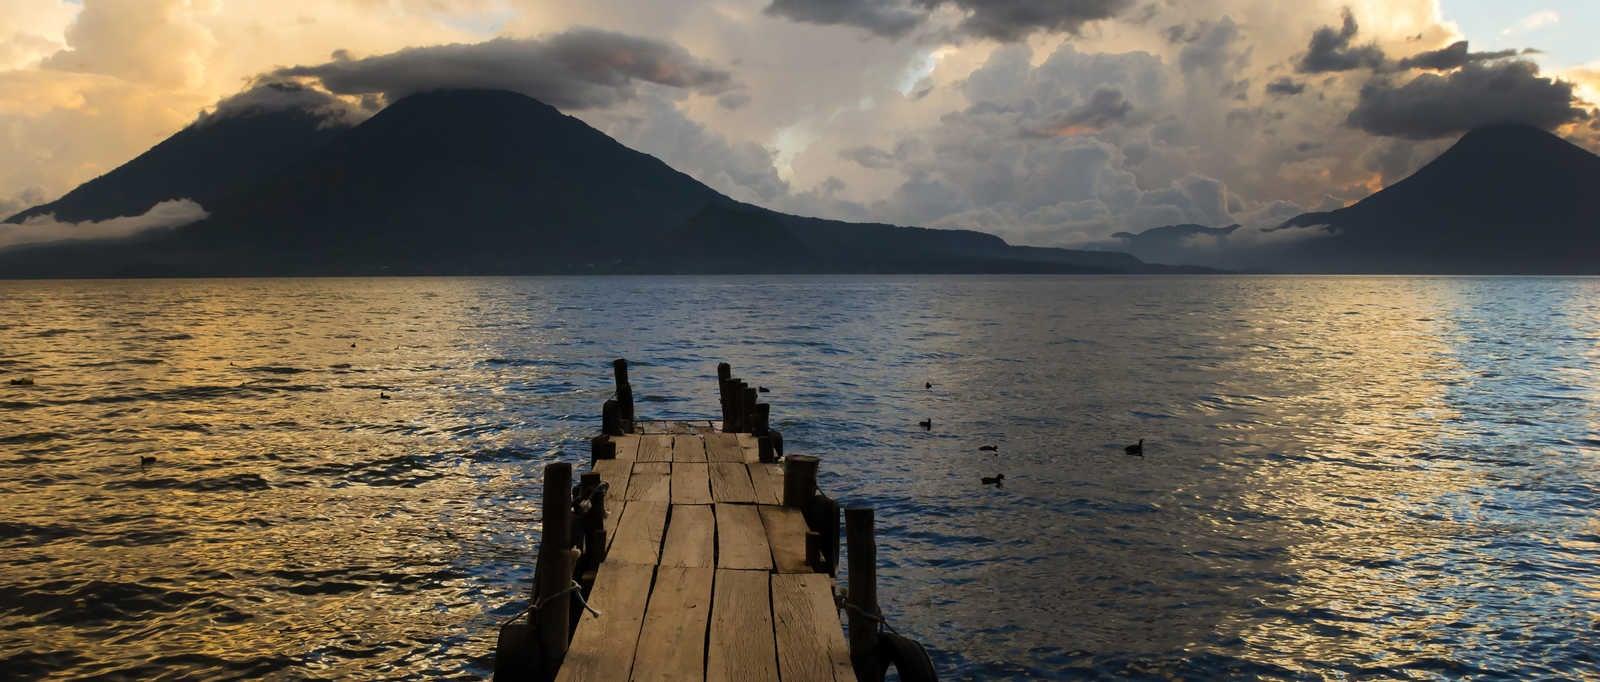 Sunset on Lake Atitlan, Guatemala